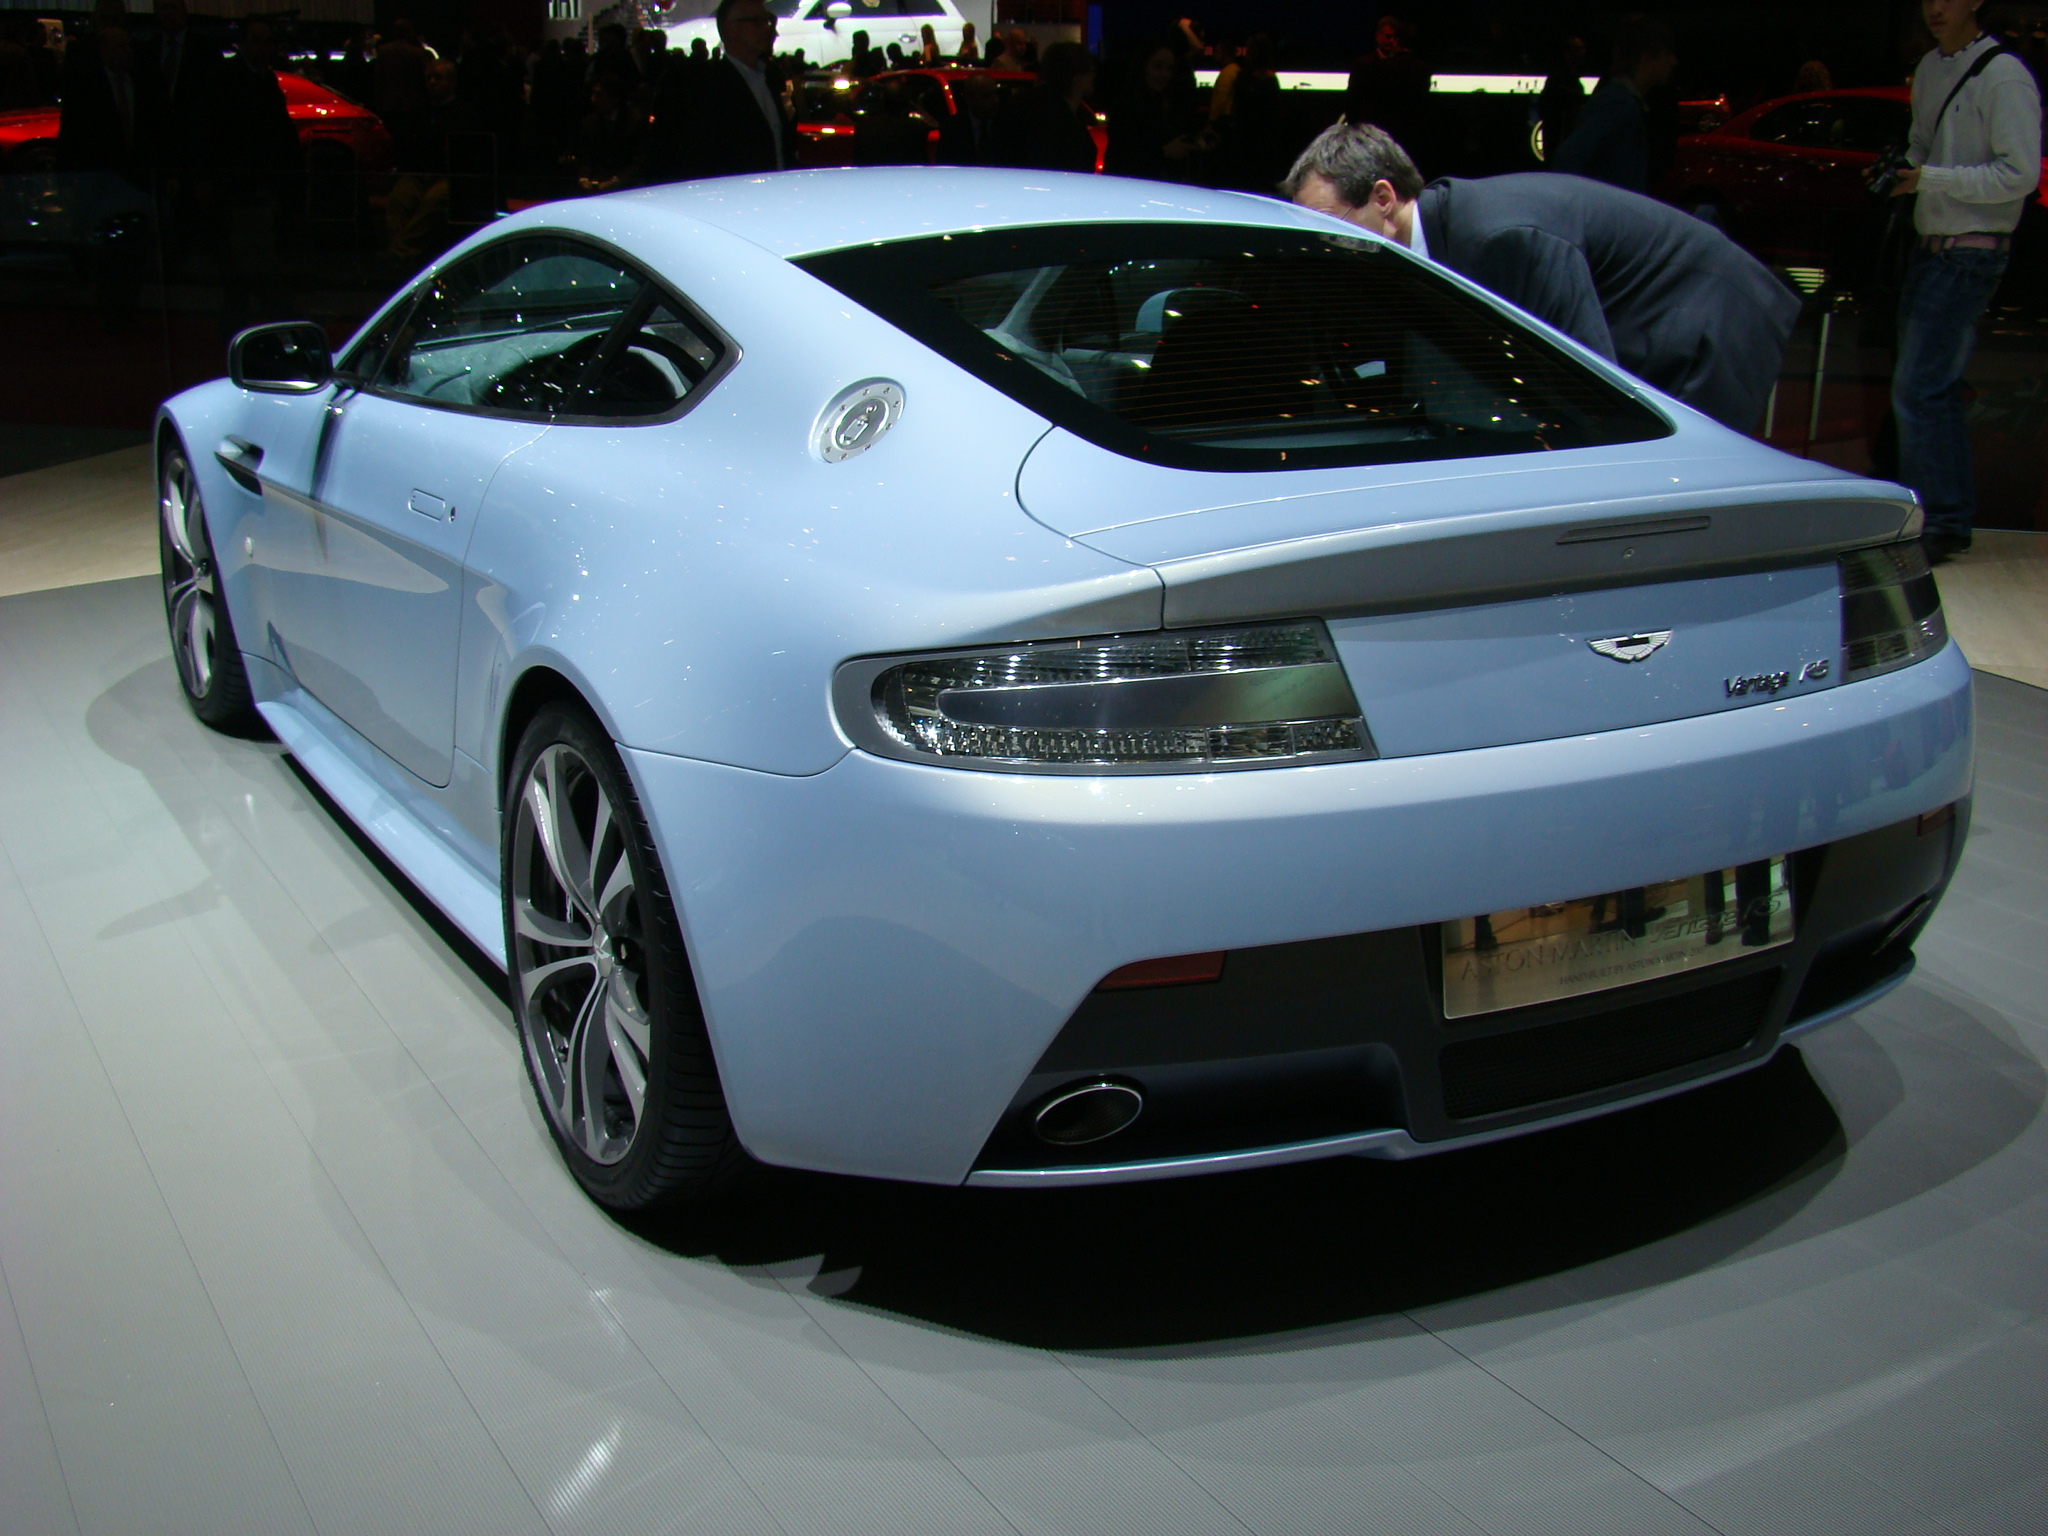 http://images.caradisiac.com/images/3/0/6/8/23068/S0-Salon-de-Geneve-Aston-Martin-V12-Vantage-RS-en-direct-petite-merveille-98394.jpg